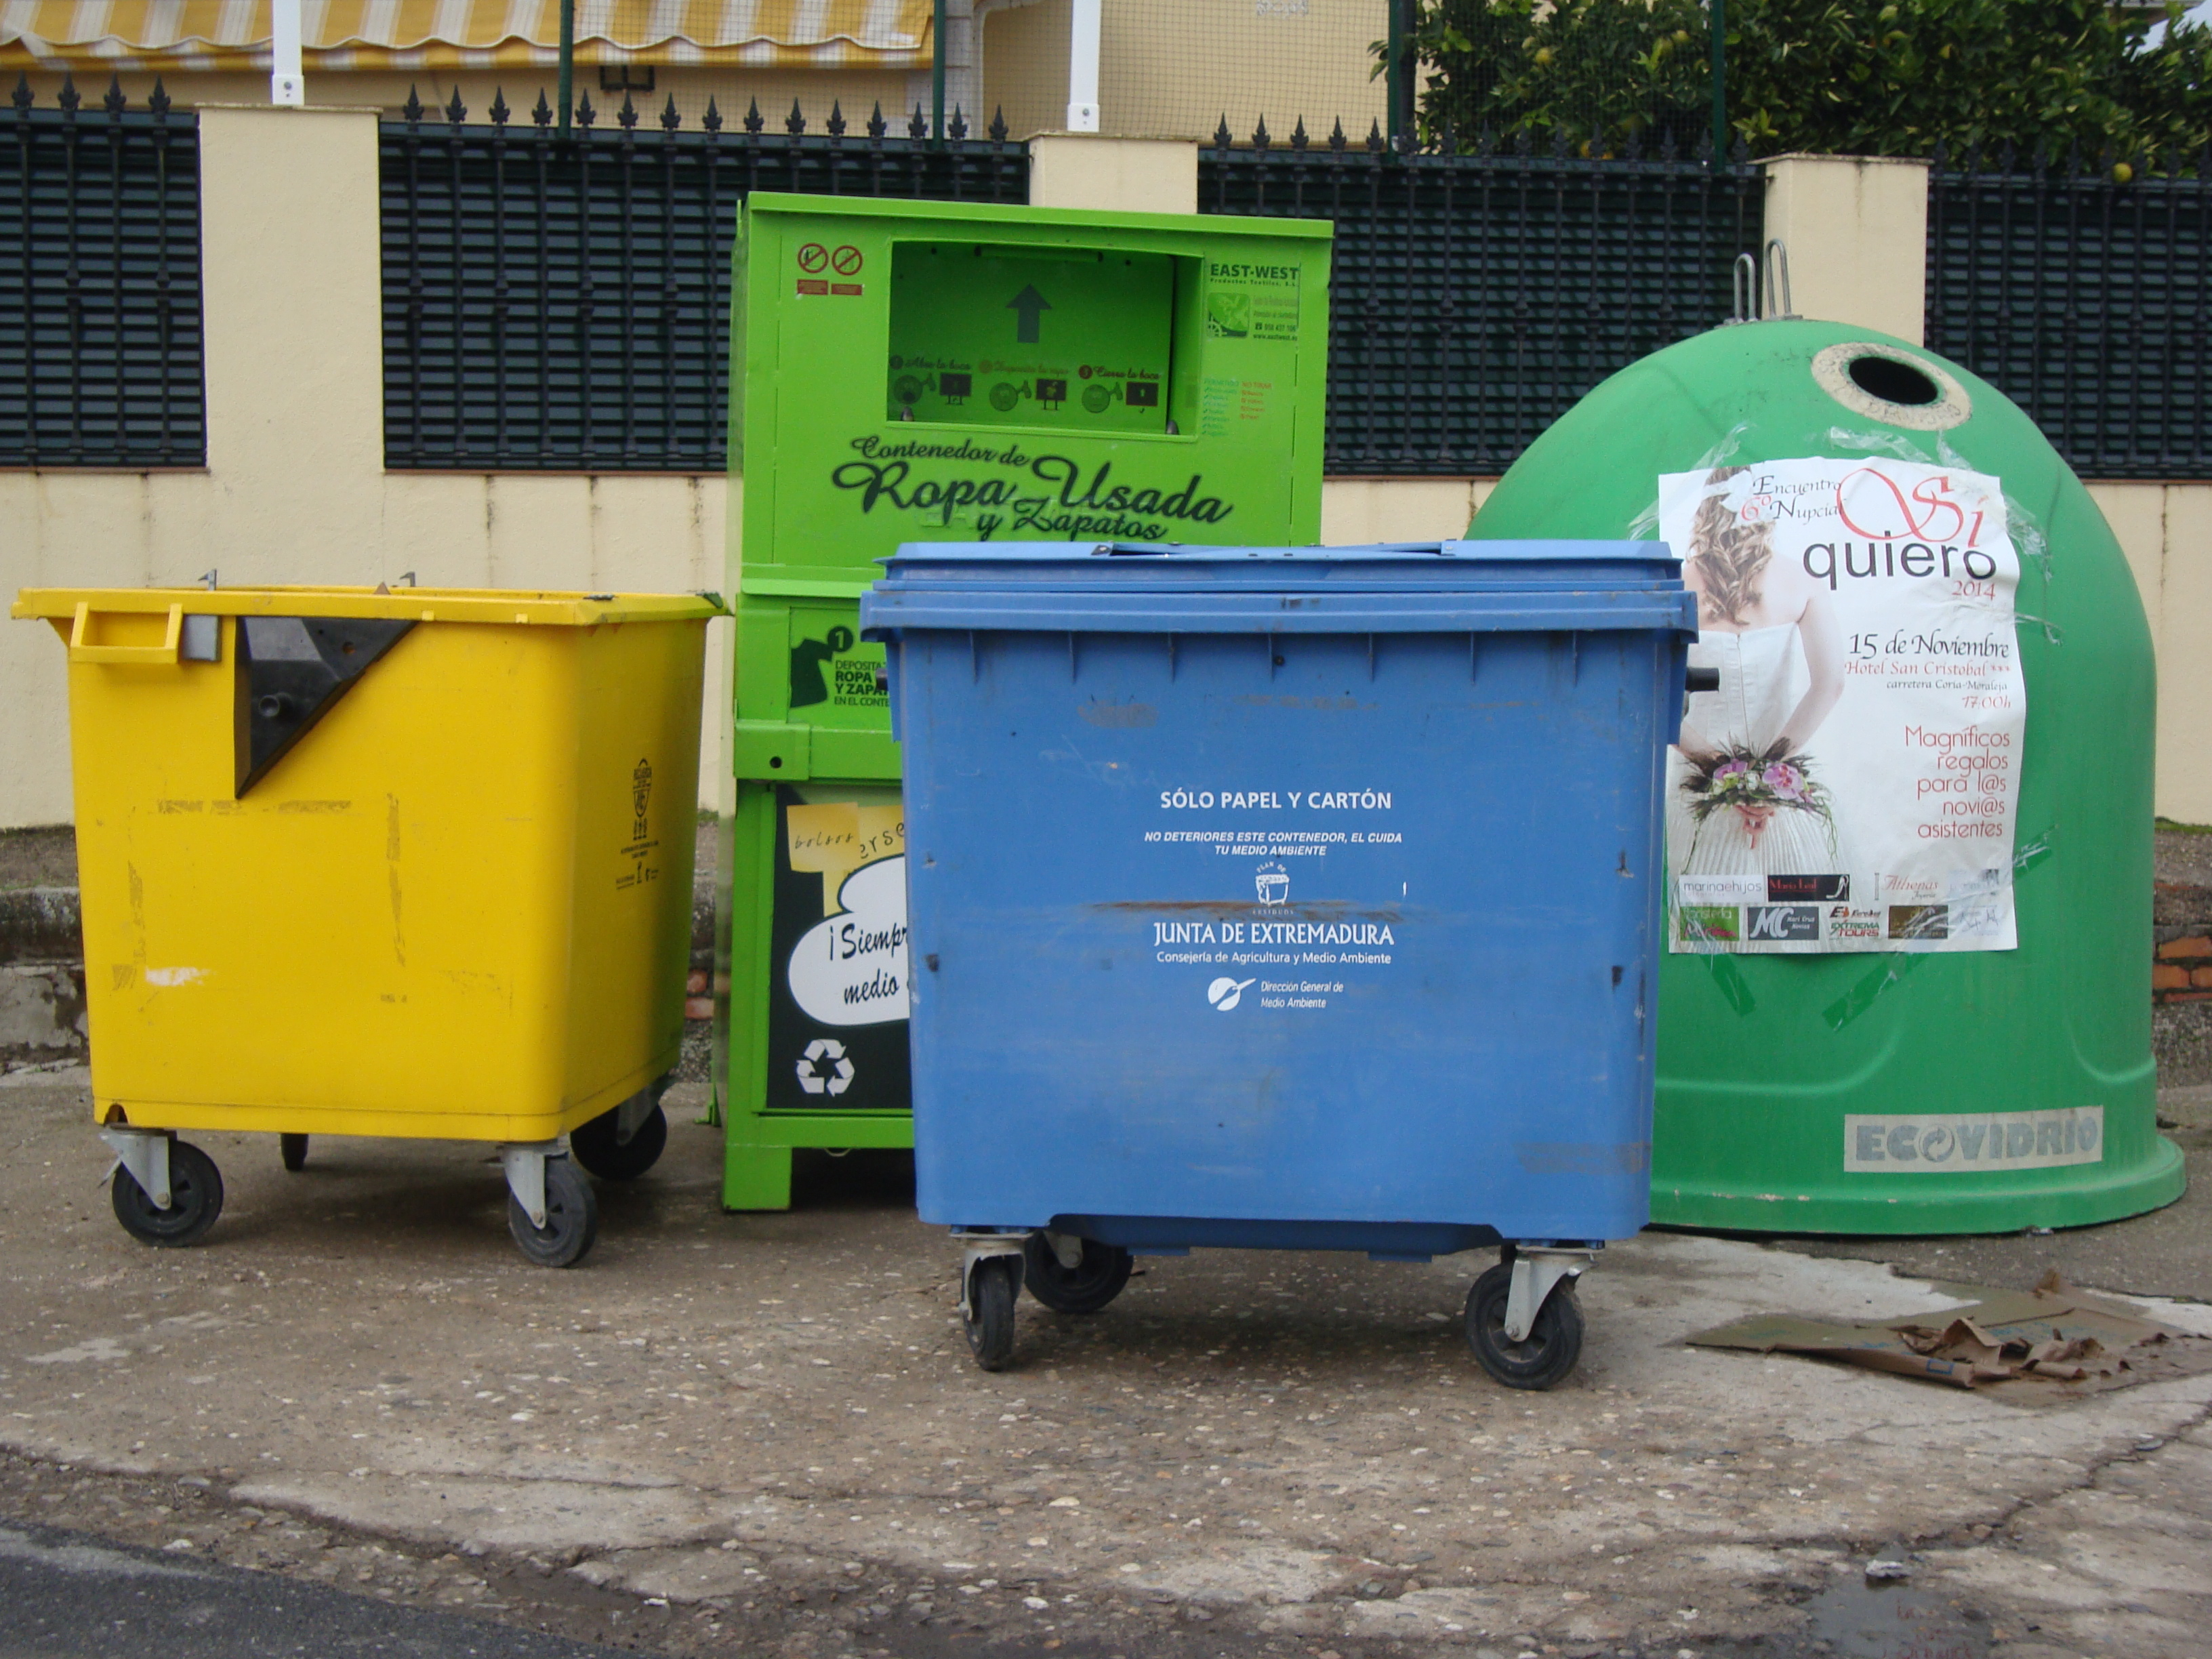 Horario de basuras en verano